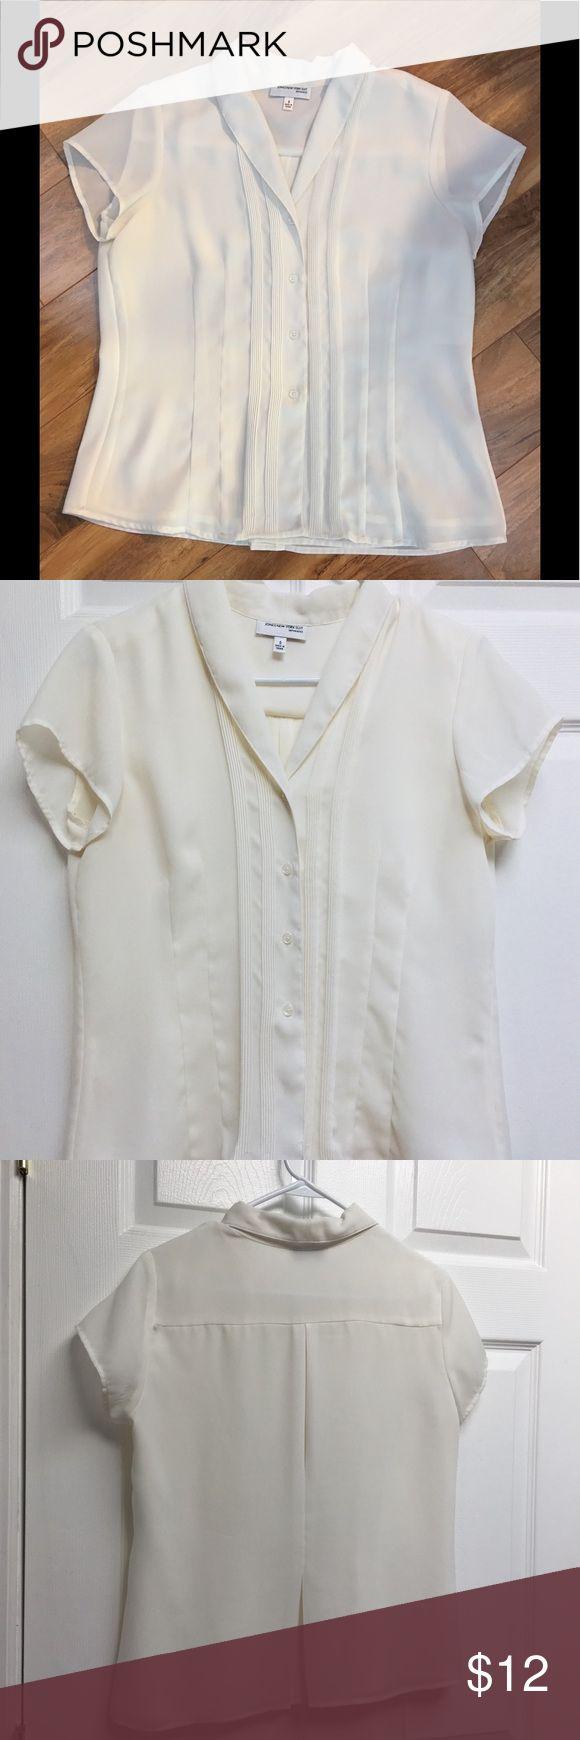 Jones New York s/s blouse size 6 Jones New York Suit Separates Short sleeve Beige/cream color Size 6 Jones New York Tops Blouses